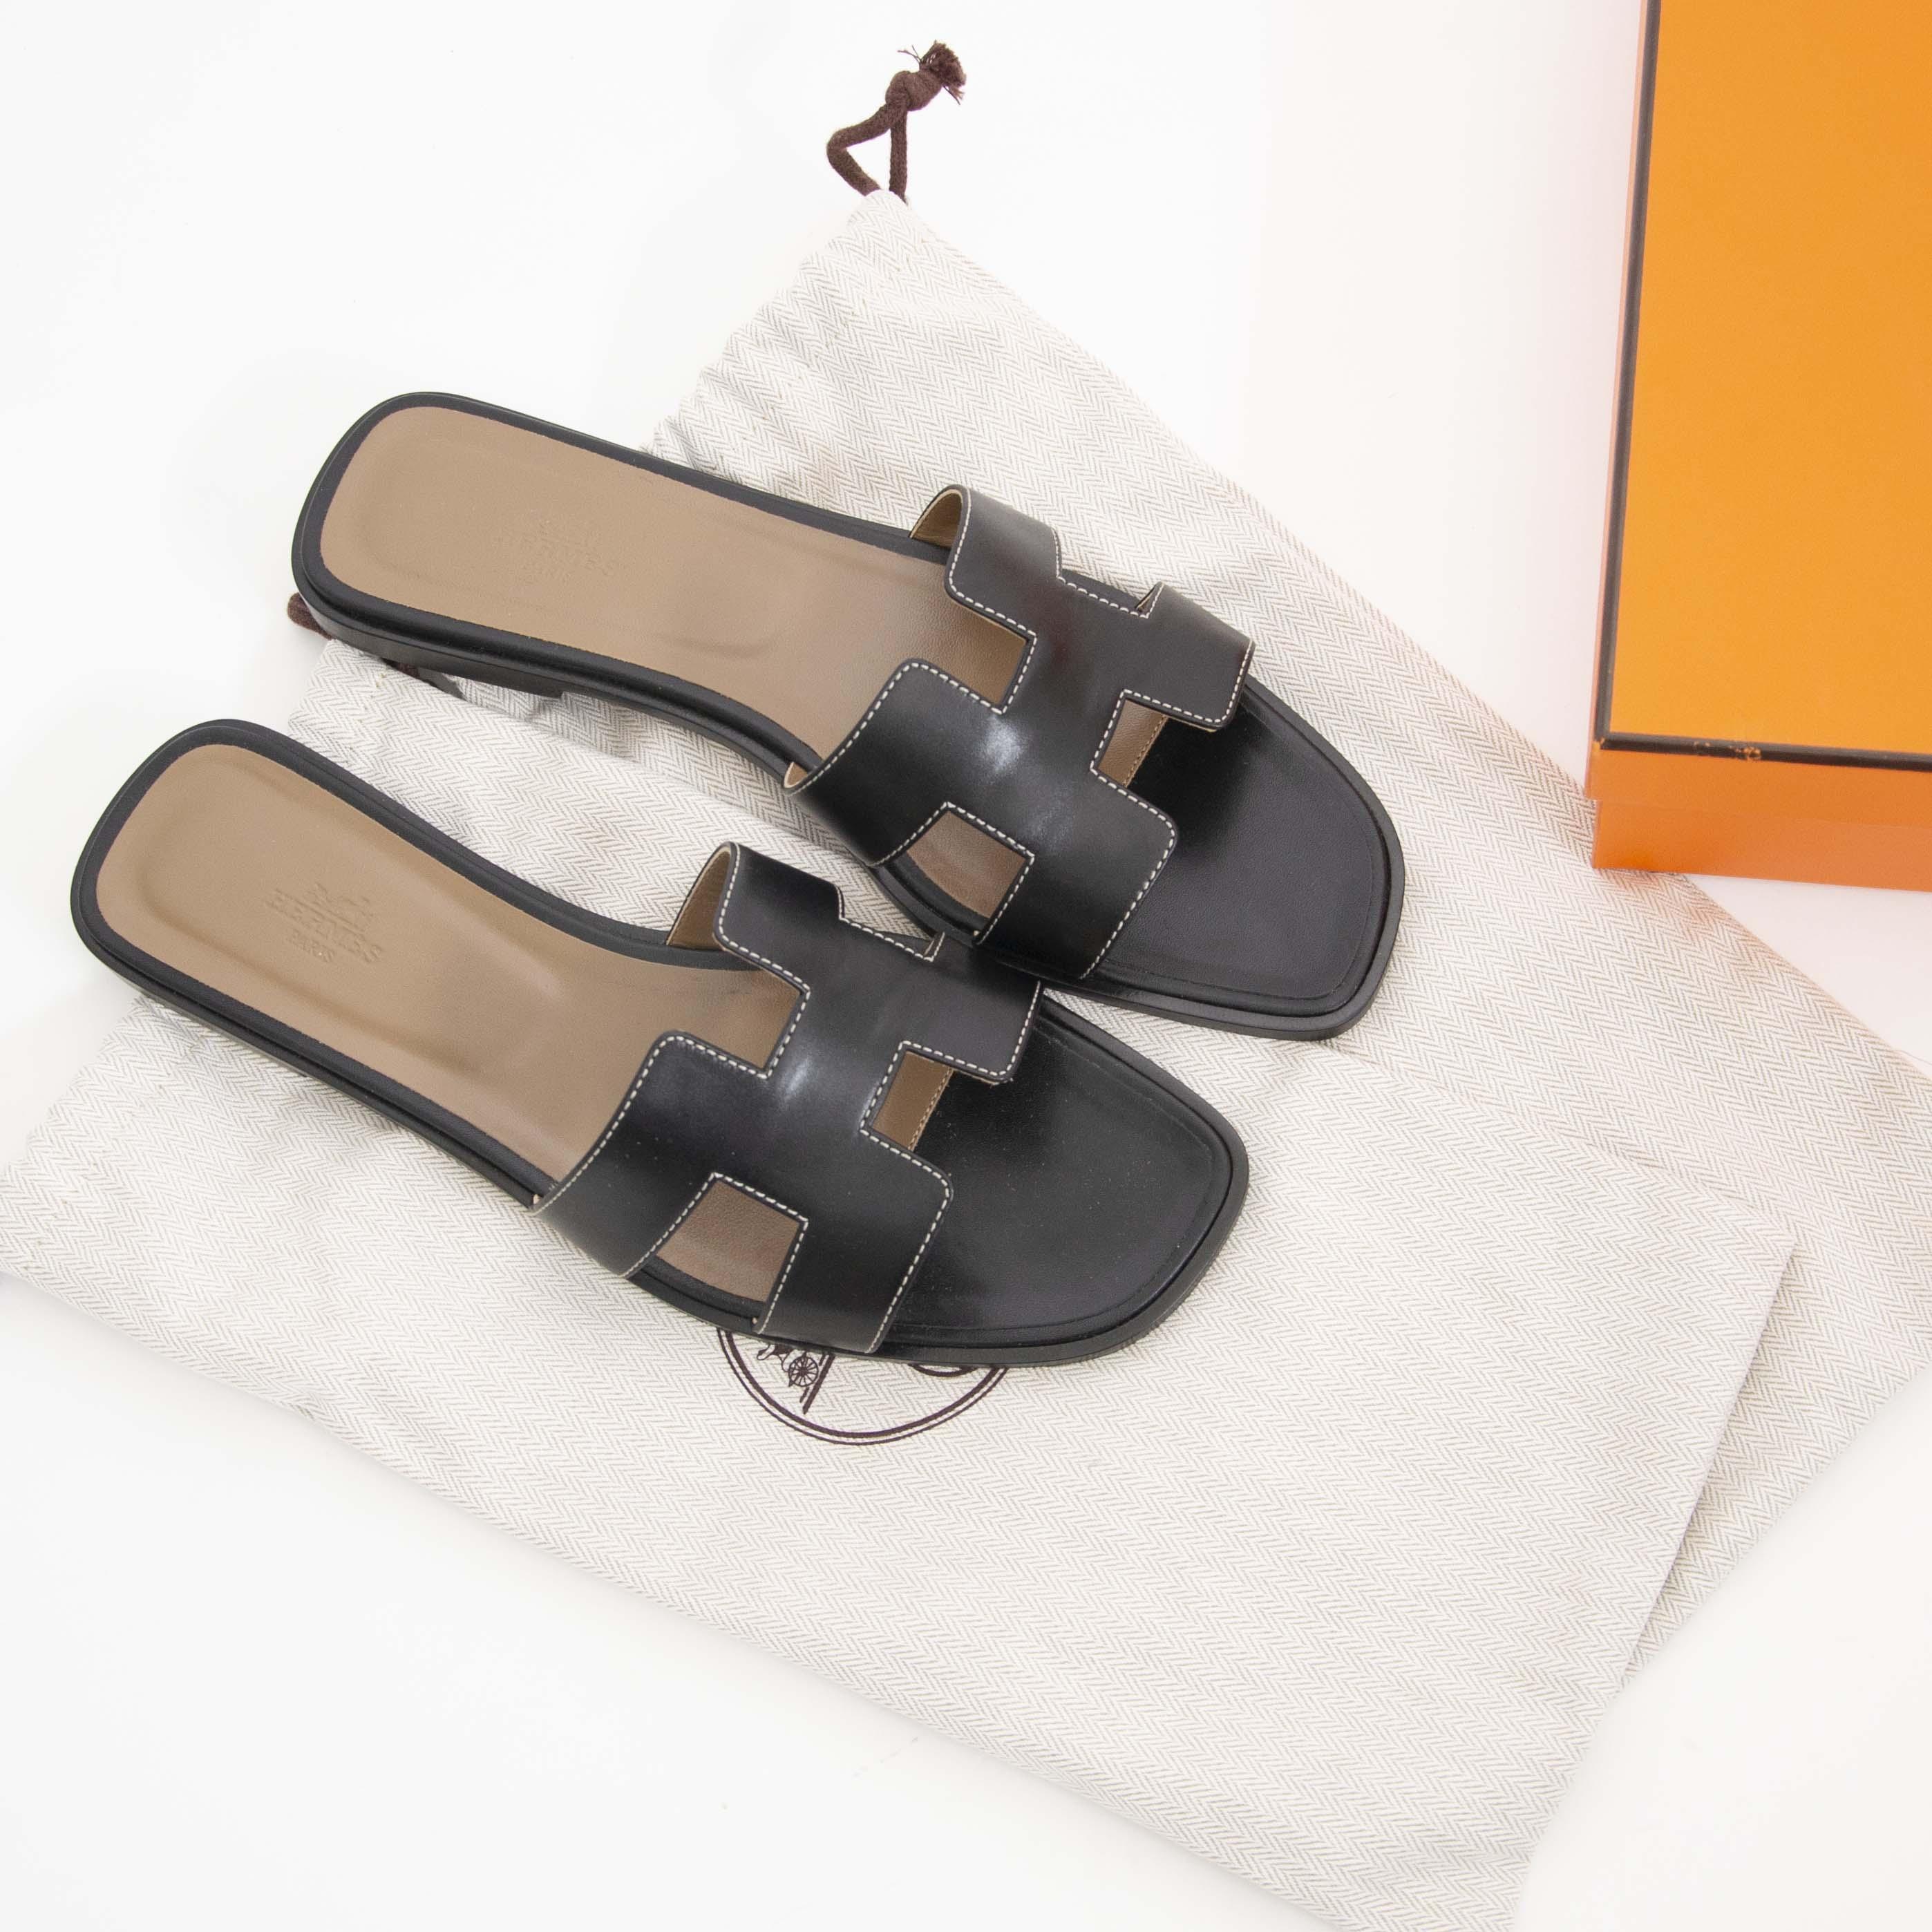 acheter en ligne seconde main Hermes Black Oran Boxcalf Sandale  - size 41